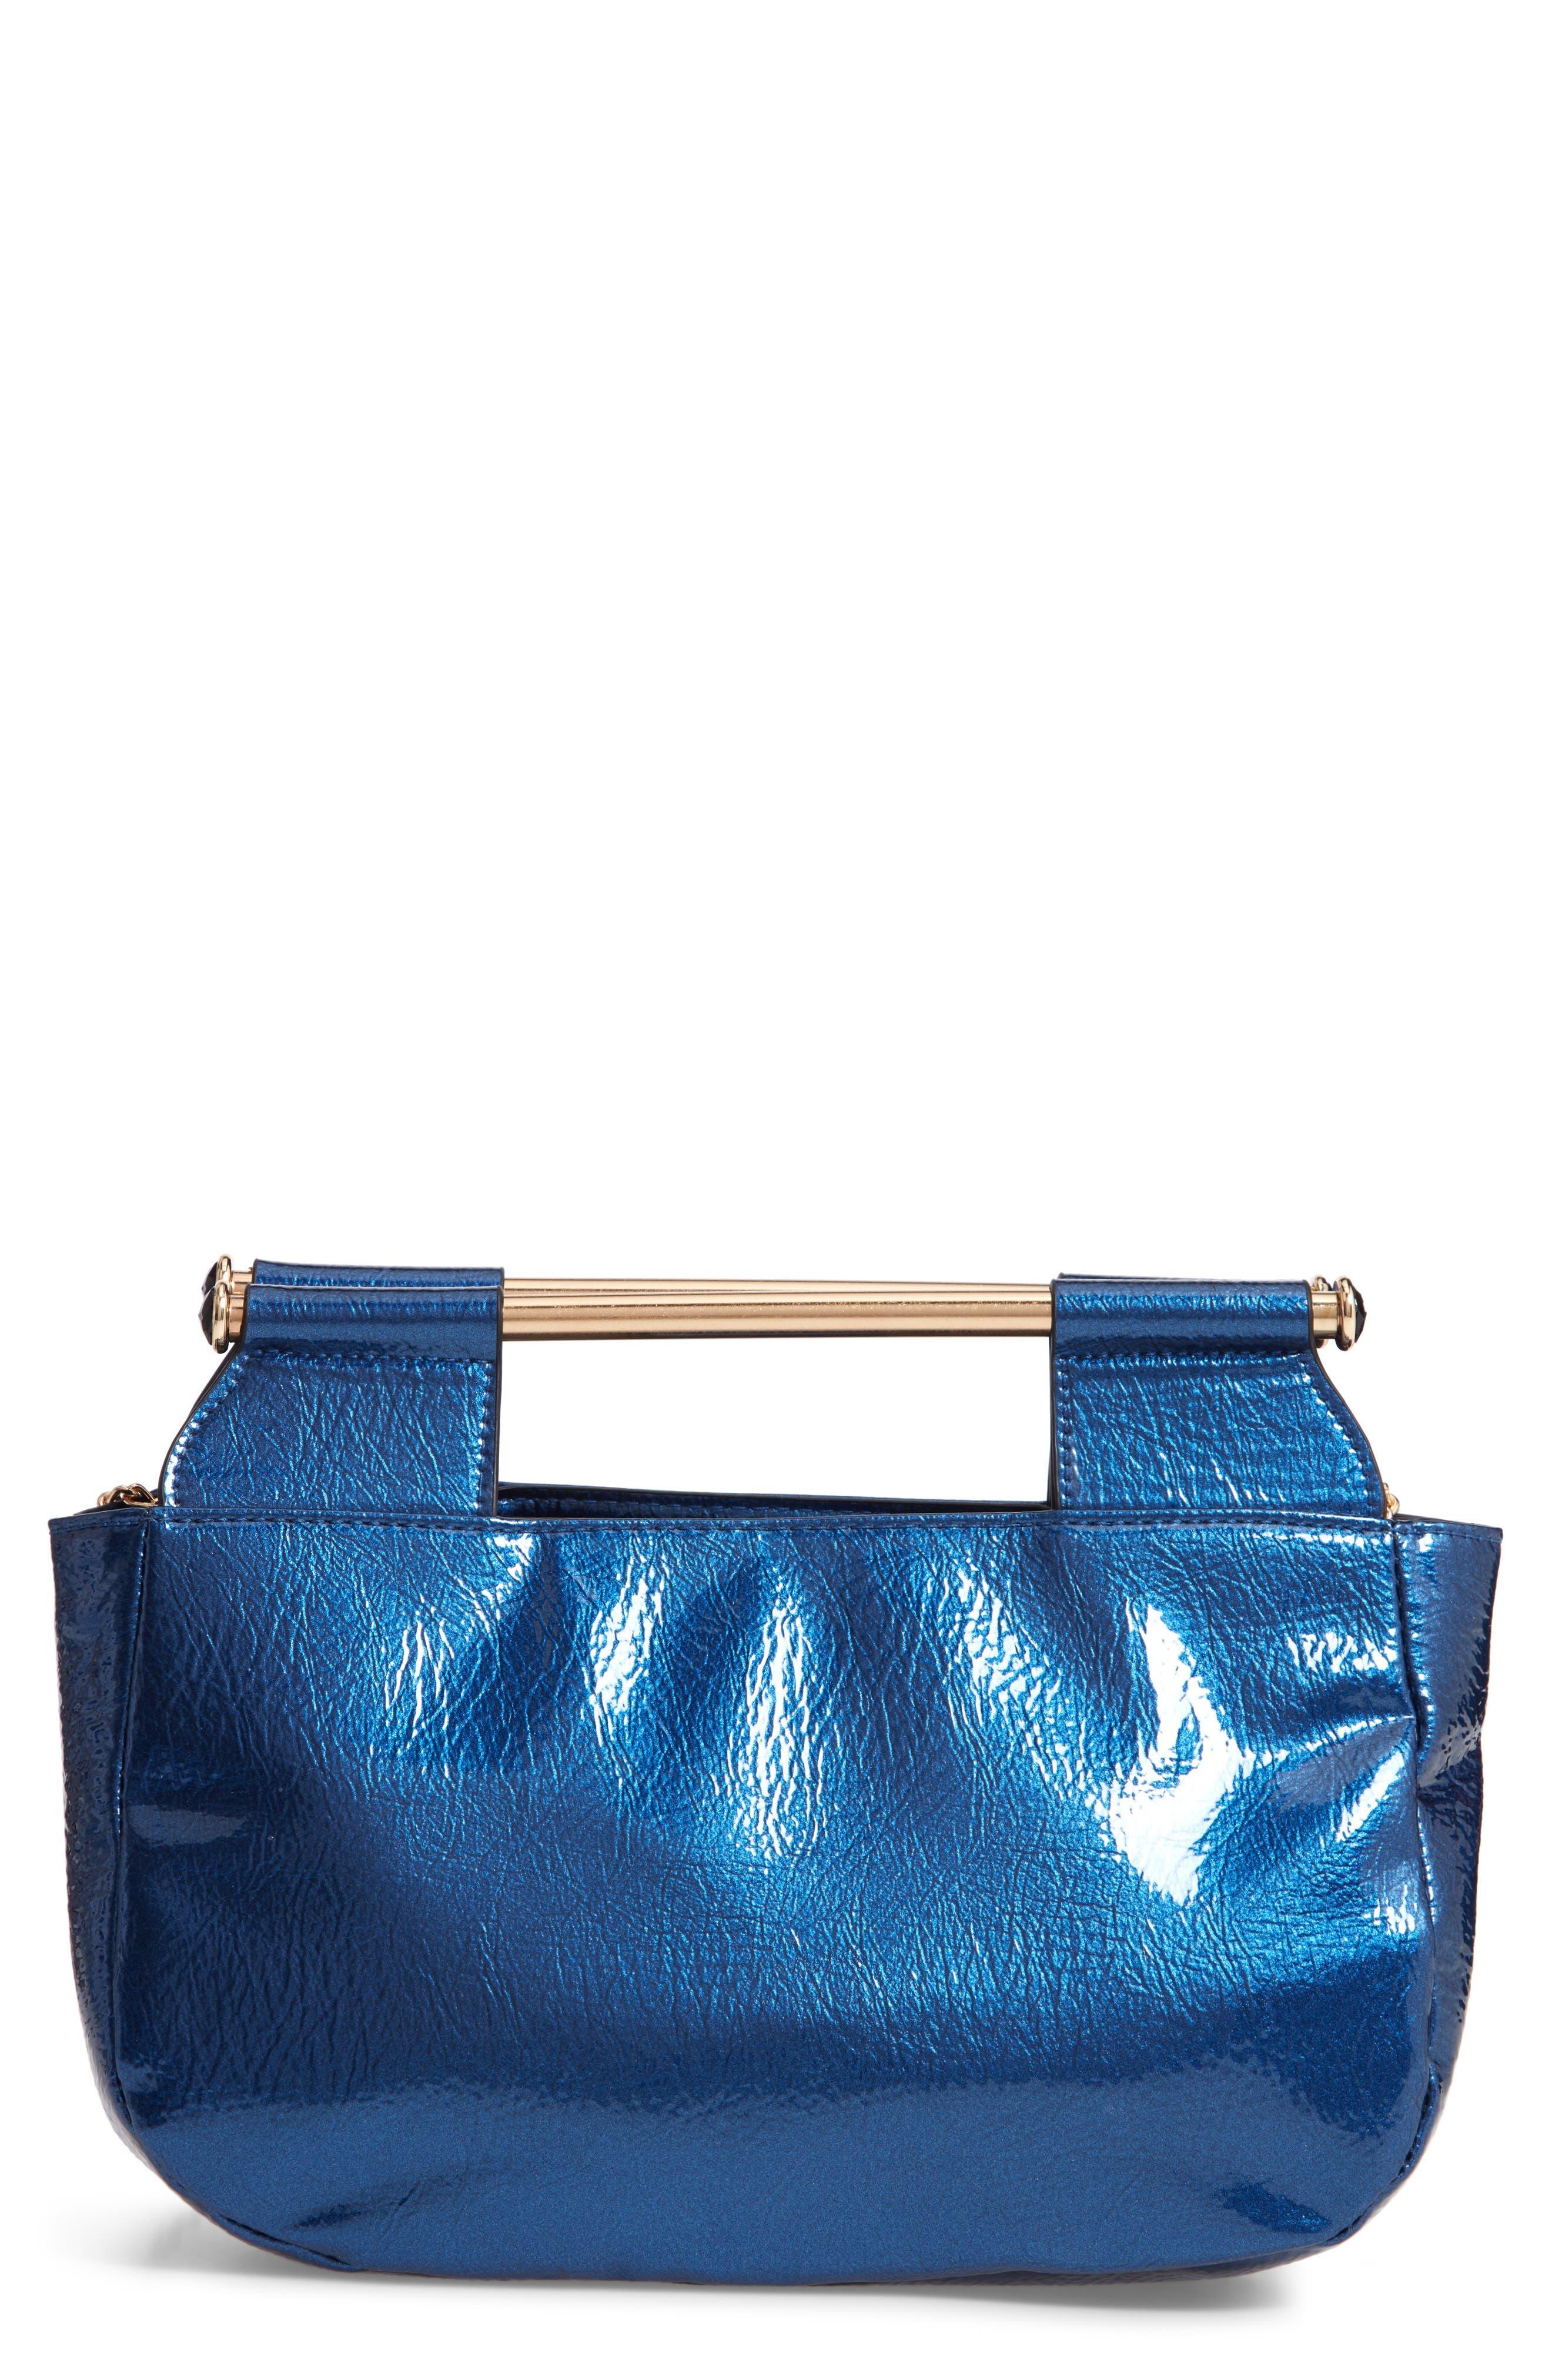 Patent Leather Crossbody Bag,                             Main thumbnail 1, color,                             400